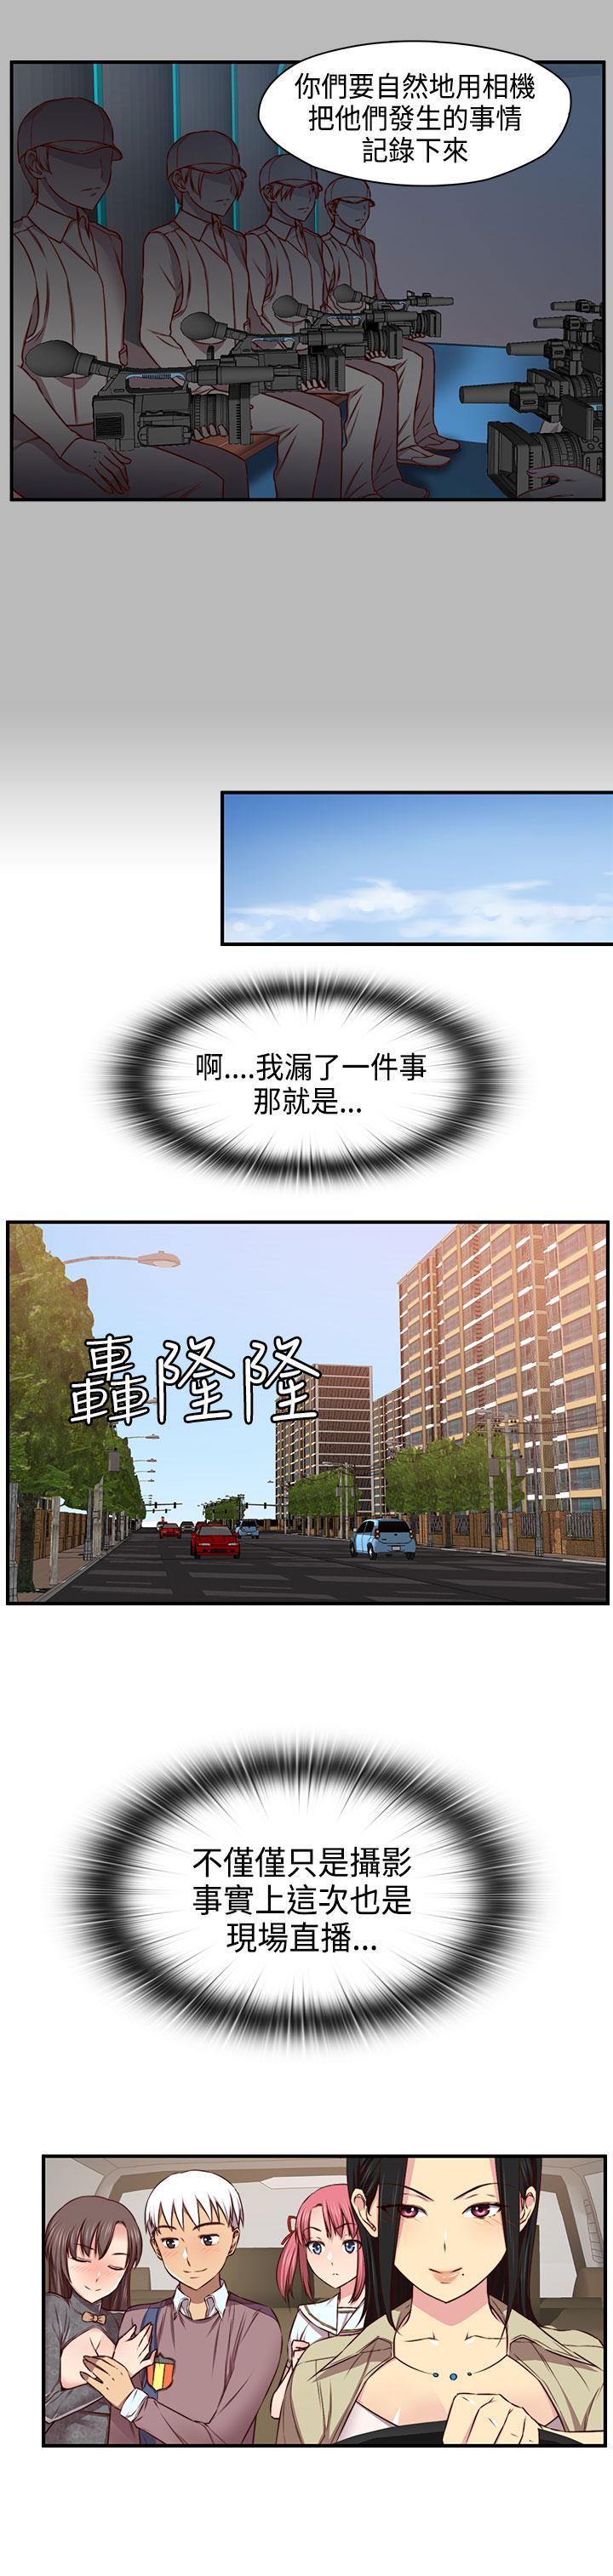 [Dasum & Puutaro] H-Campus H校园<第2季> ch.41-46 (chinese) 131